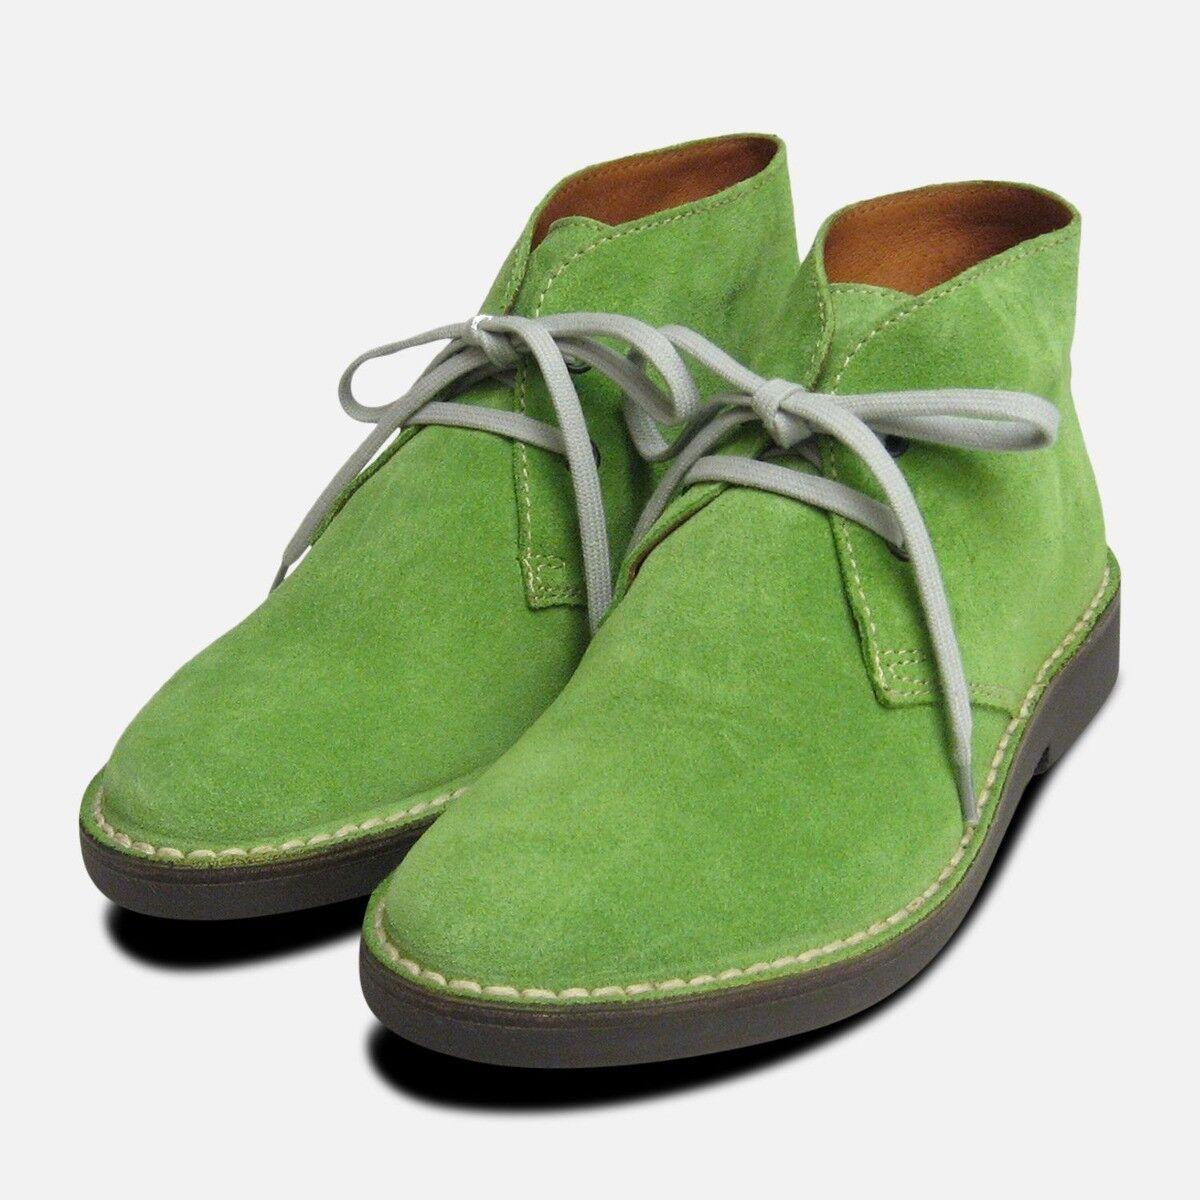 Lime Grün Suede Italian Arthur Knight Desert Stiefel